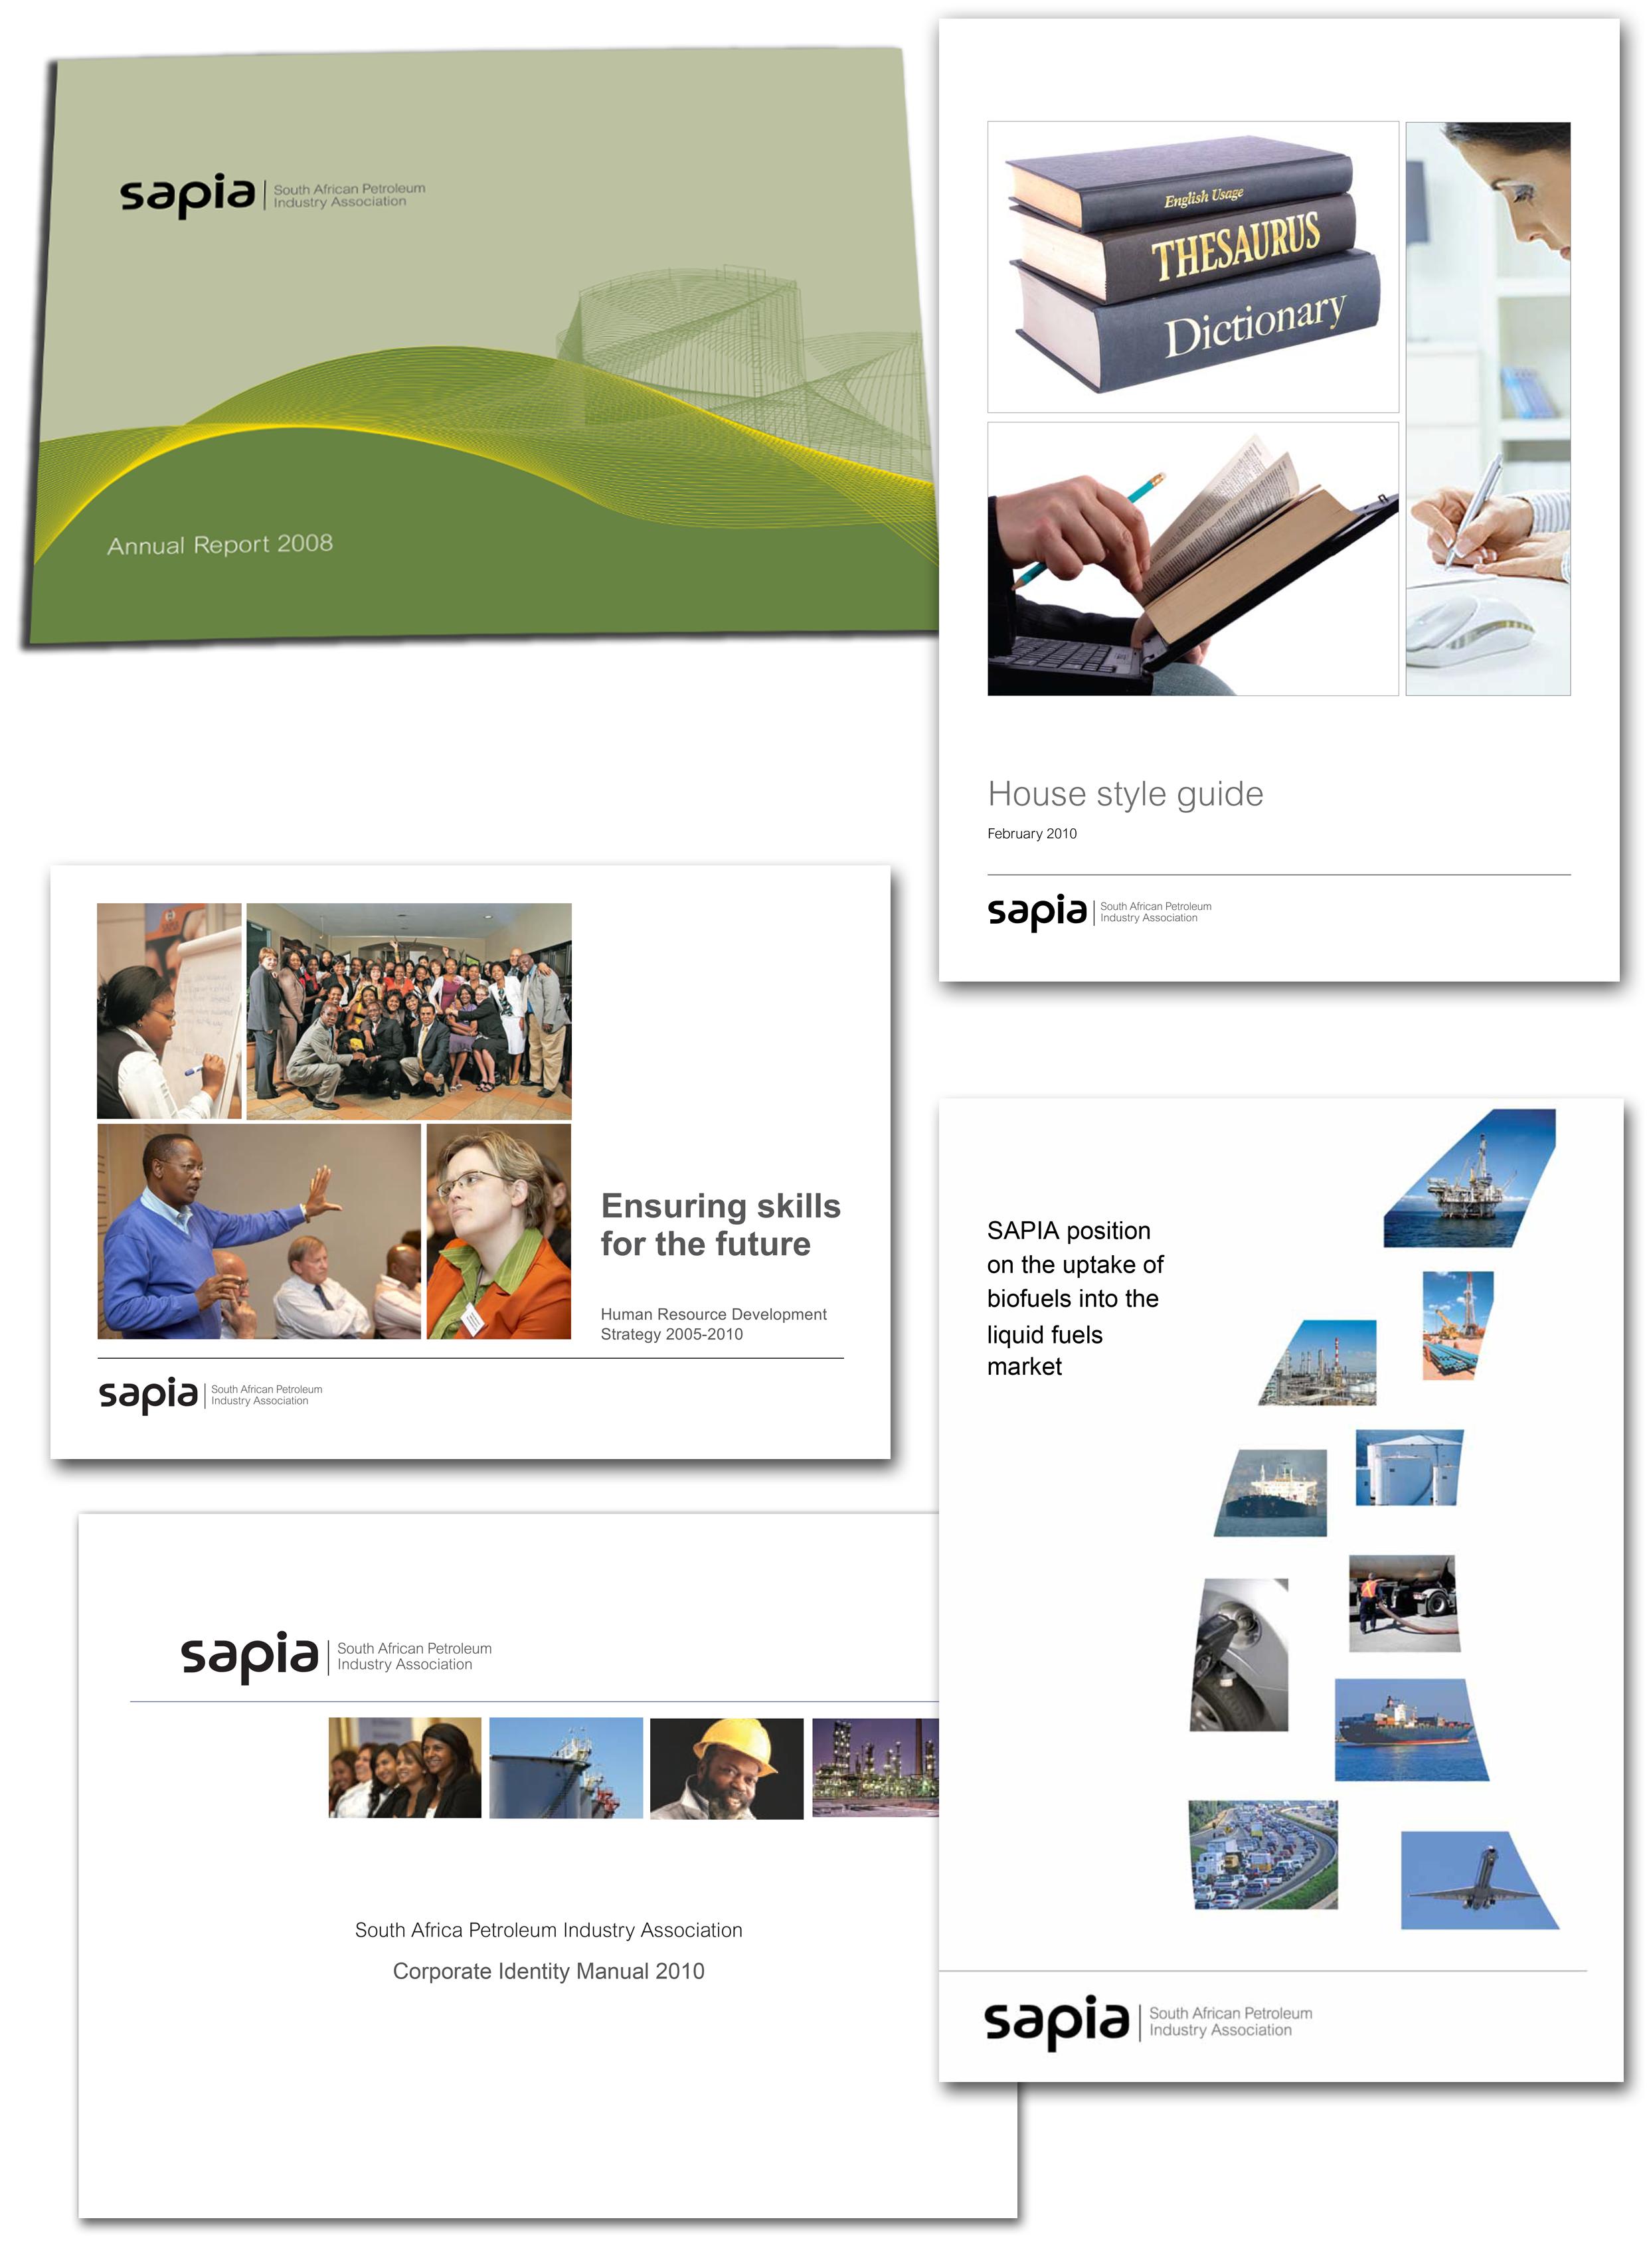 sapia-branding